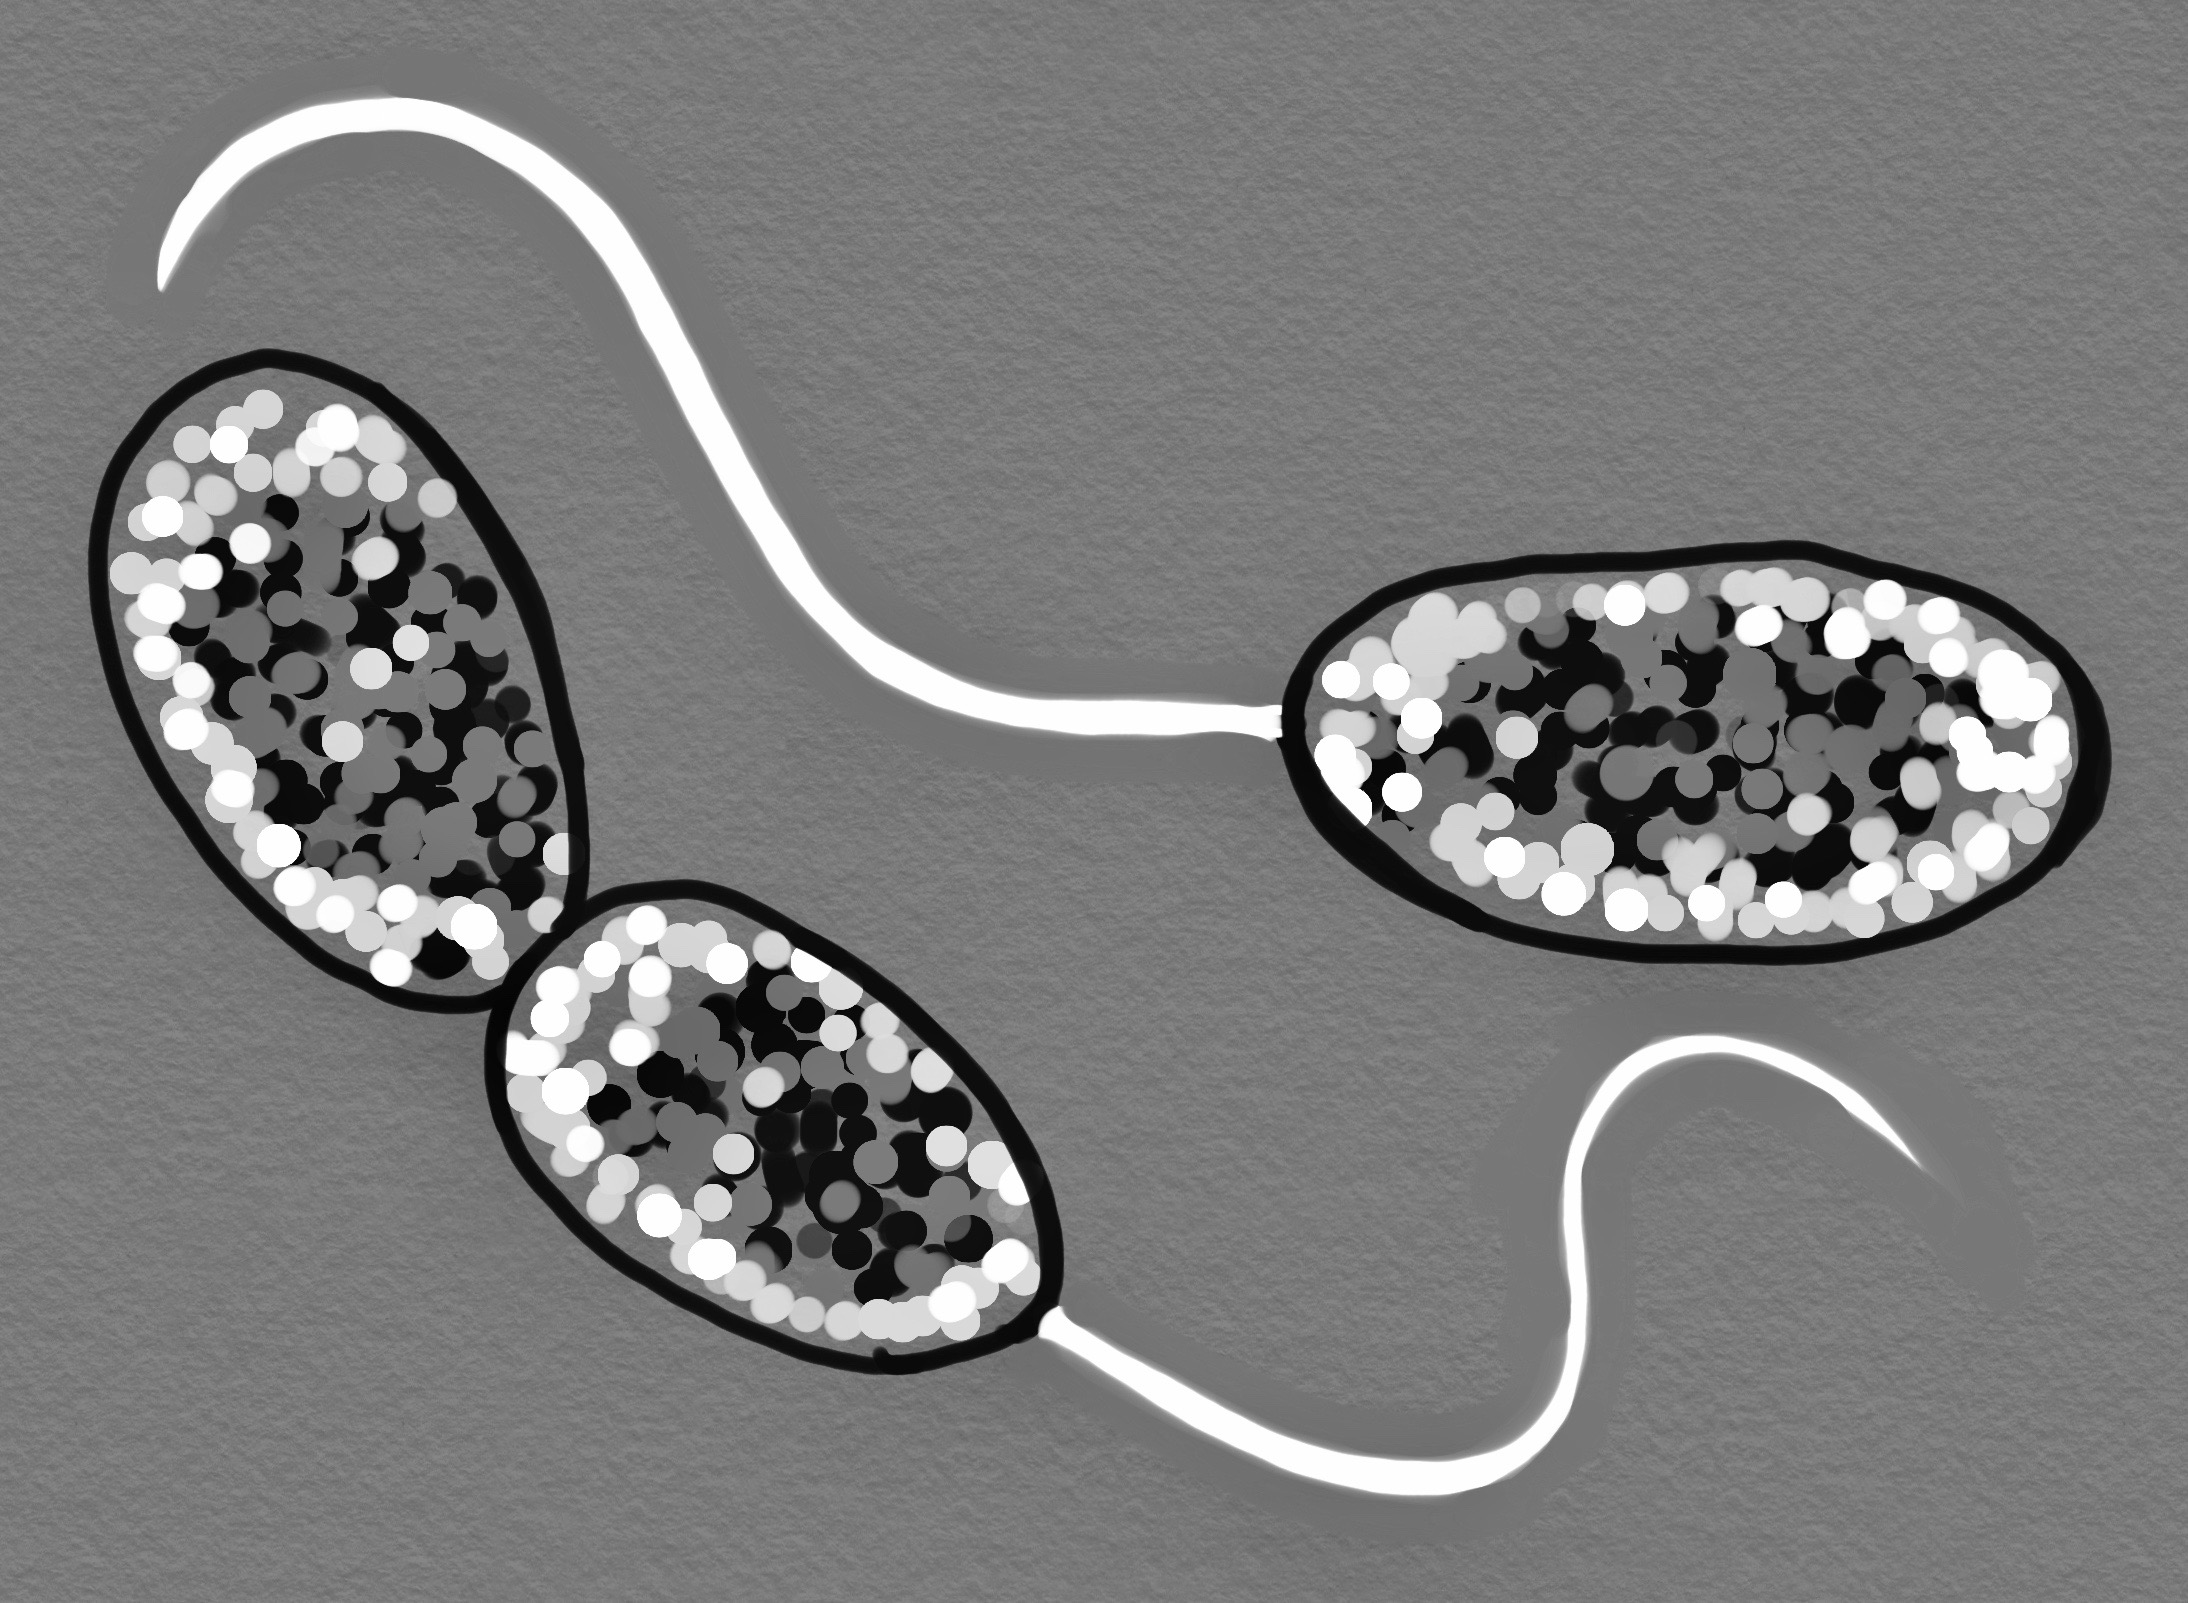 Nitrifying Bacteria